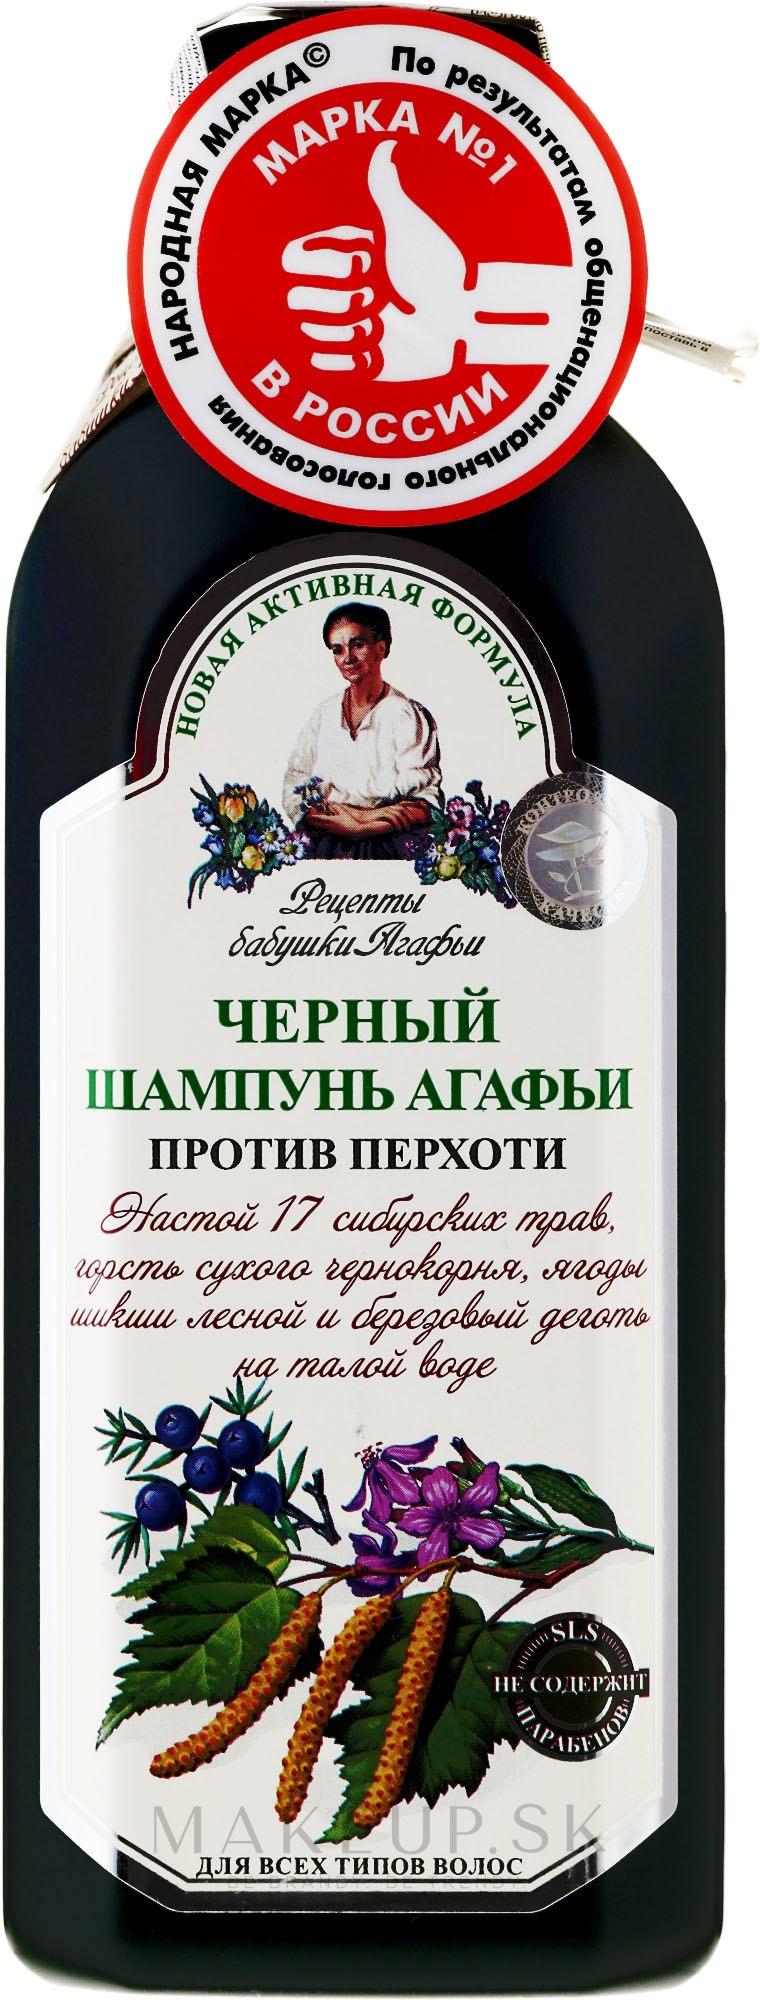 Čierny šampón proti lupinám Agafín - Recepty babičky Agafy — Obrázky 350 ml